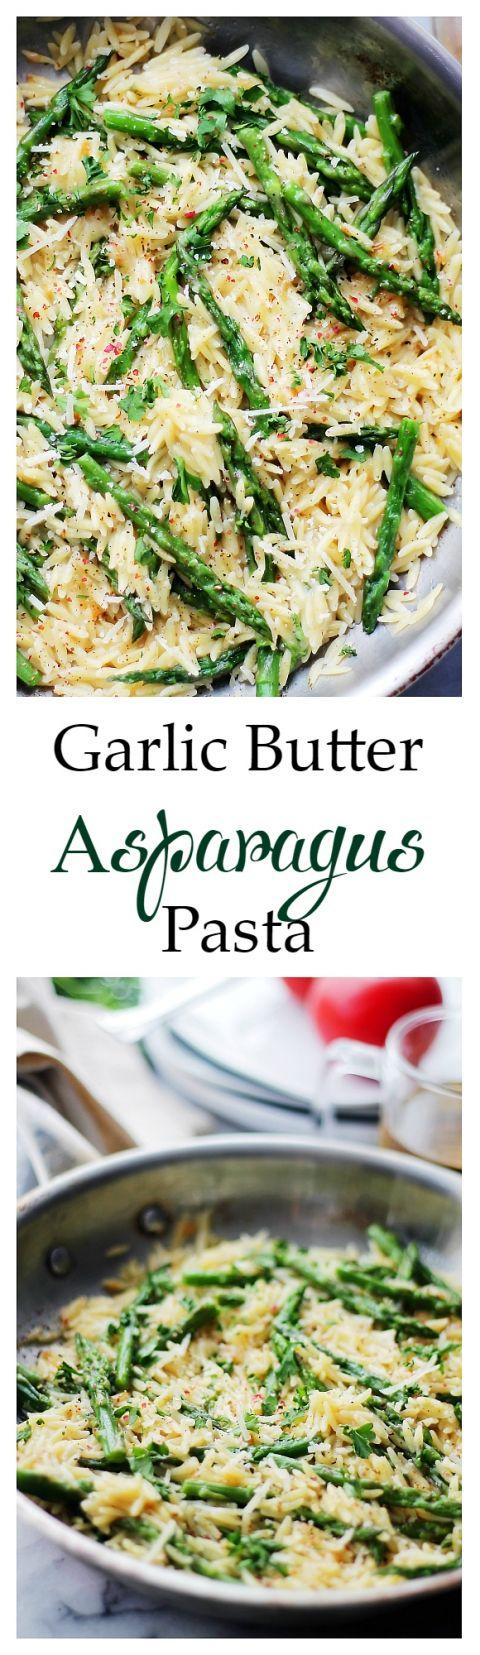 Garlic Butter Asparagus Pasta Recipe | Diethood